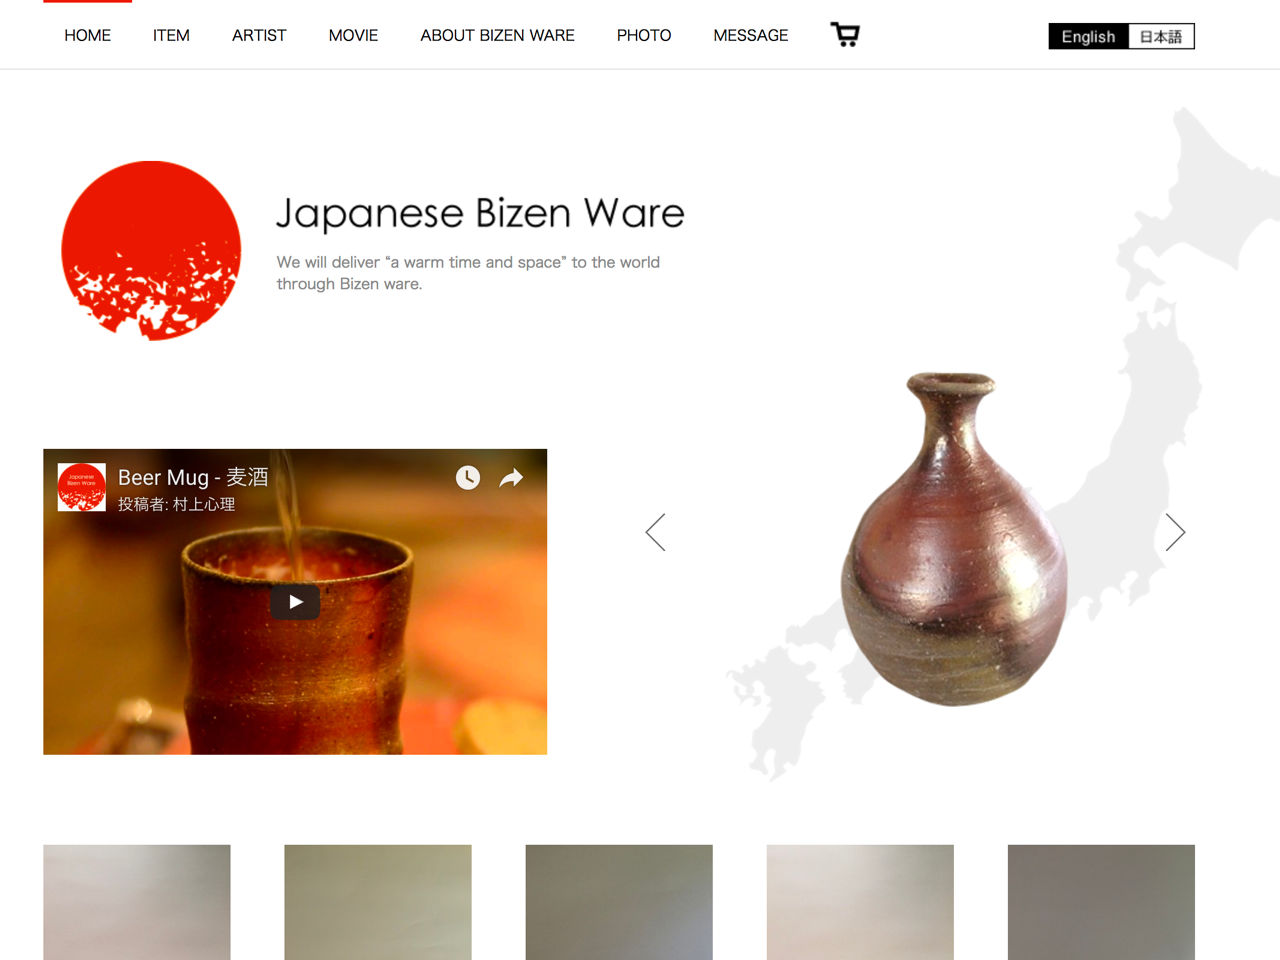 Japanese Bizen Ware